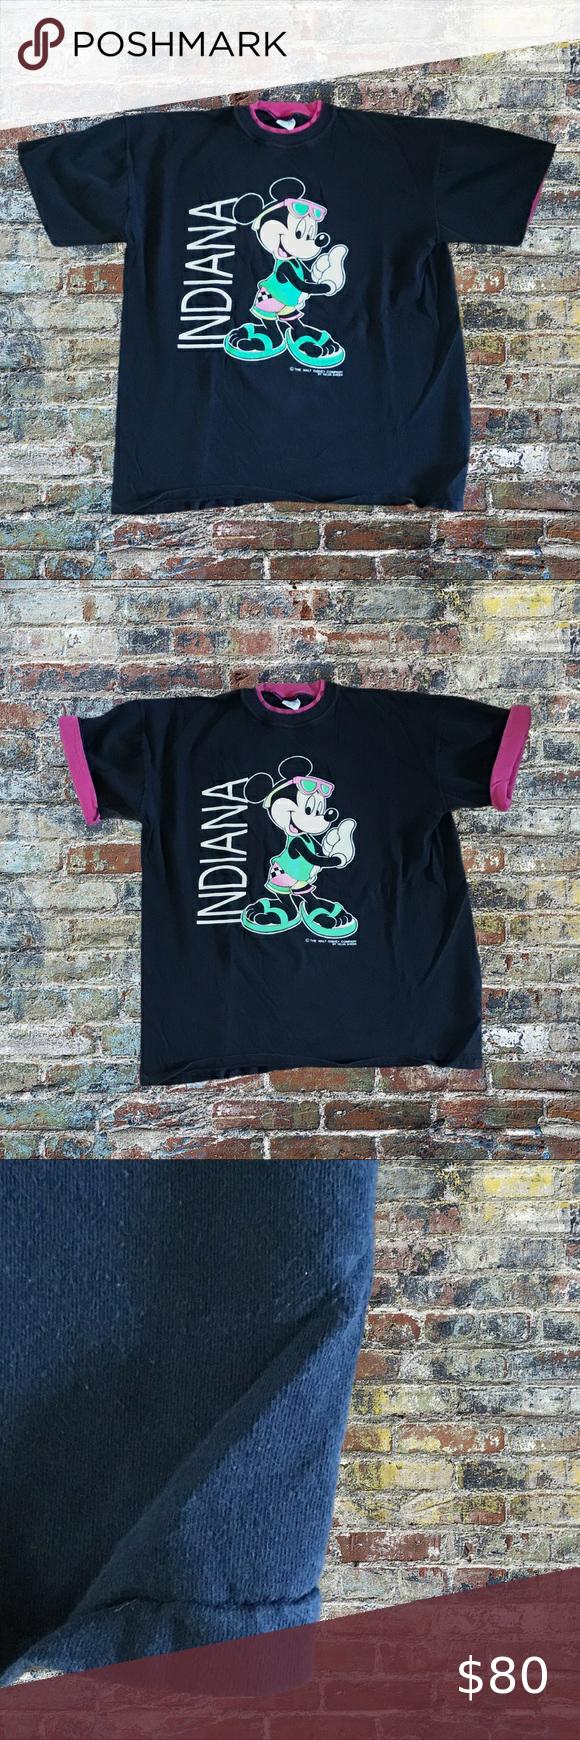 Vintage 80s Walt Disney Mickey Mouse Velma Sheen T-Shirt